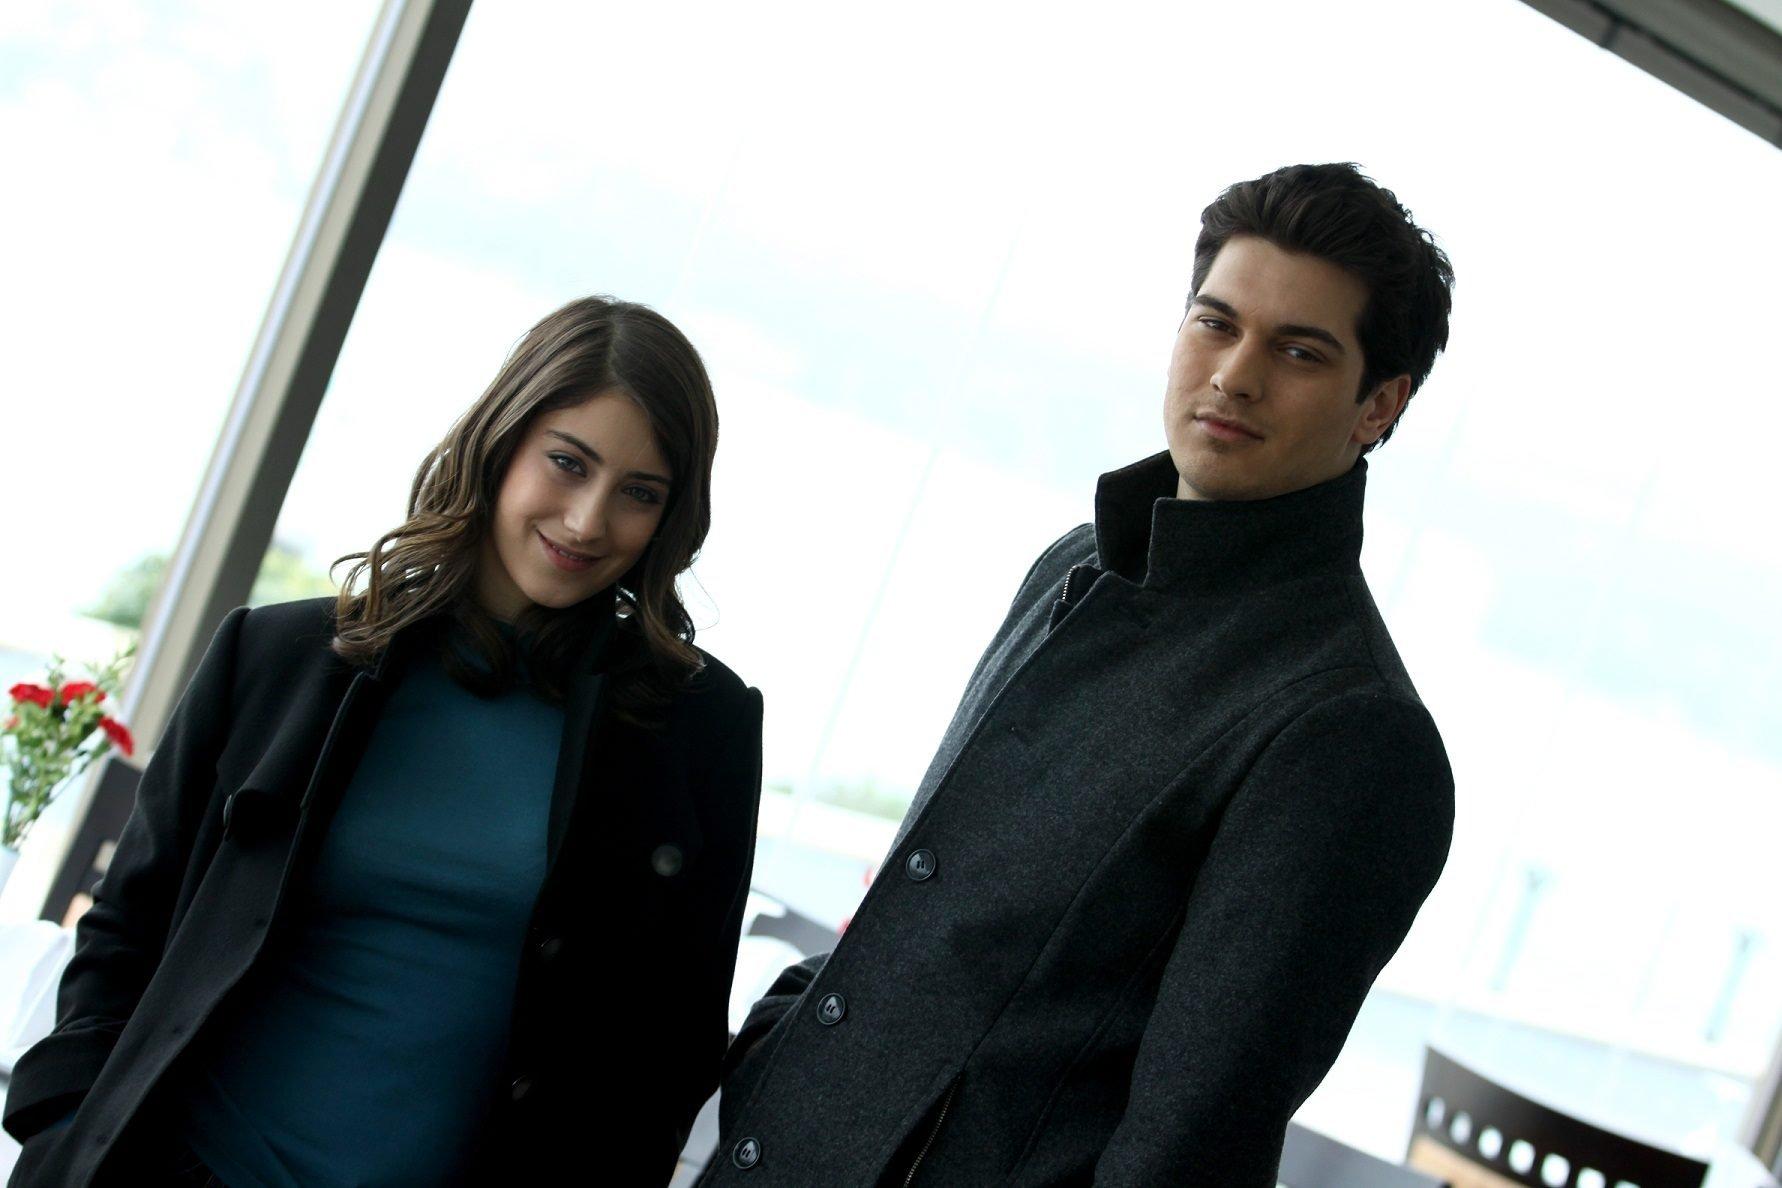 This still shot shows Hazal Kaya (L) and Çağatay Ulusoy in 'Adını Feriha Koydum' (The Ottoman), originally aired by Turkish broadcaster Show TV.